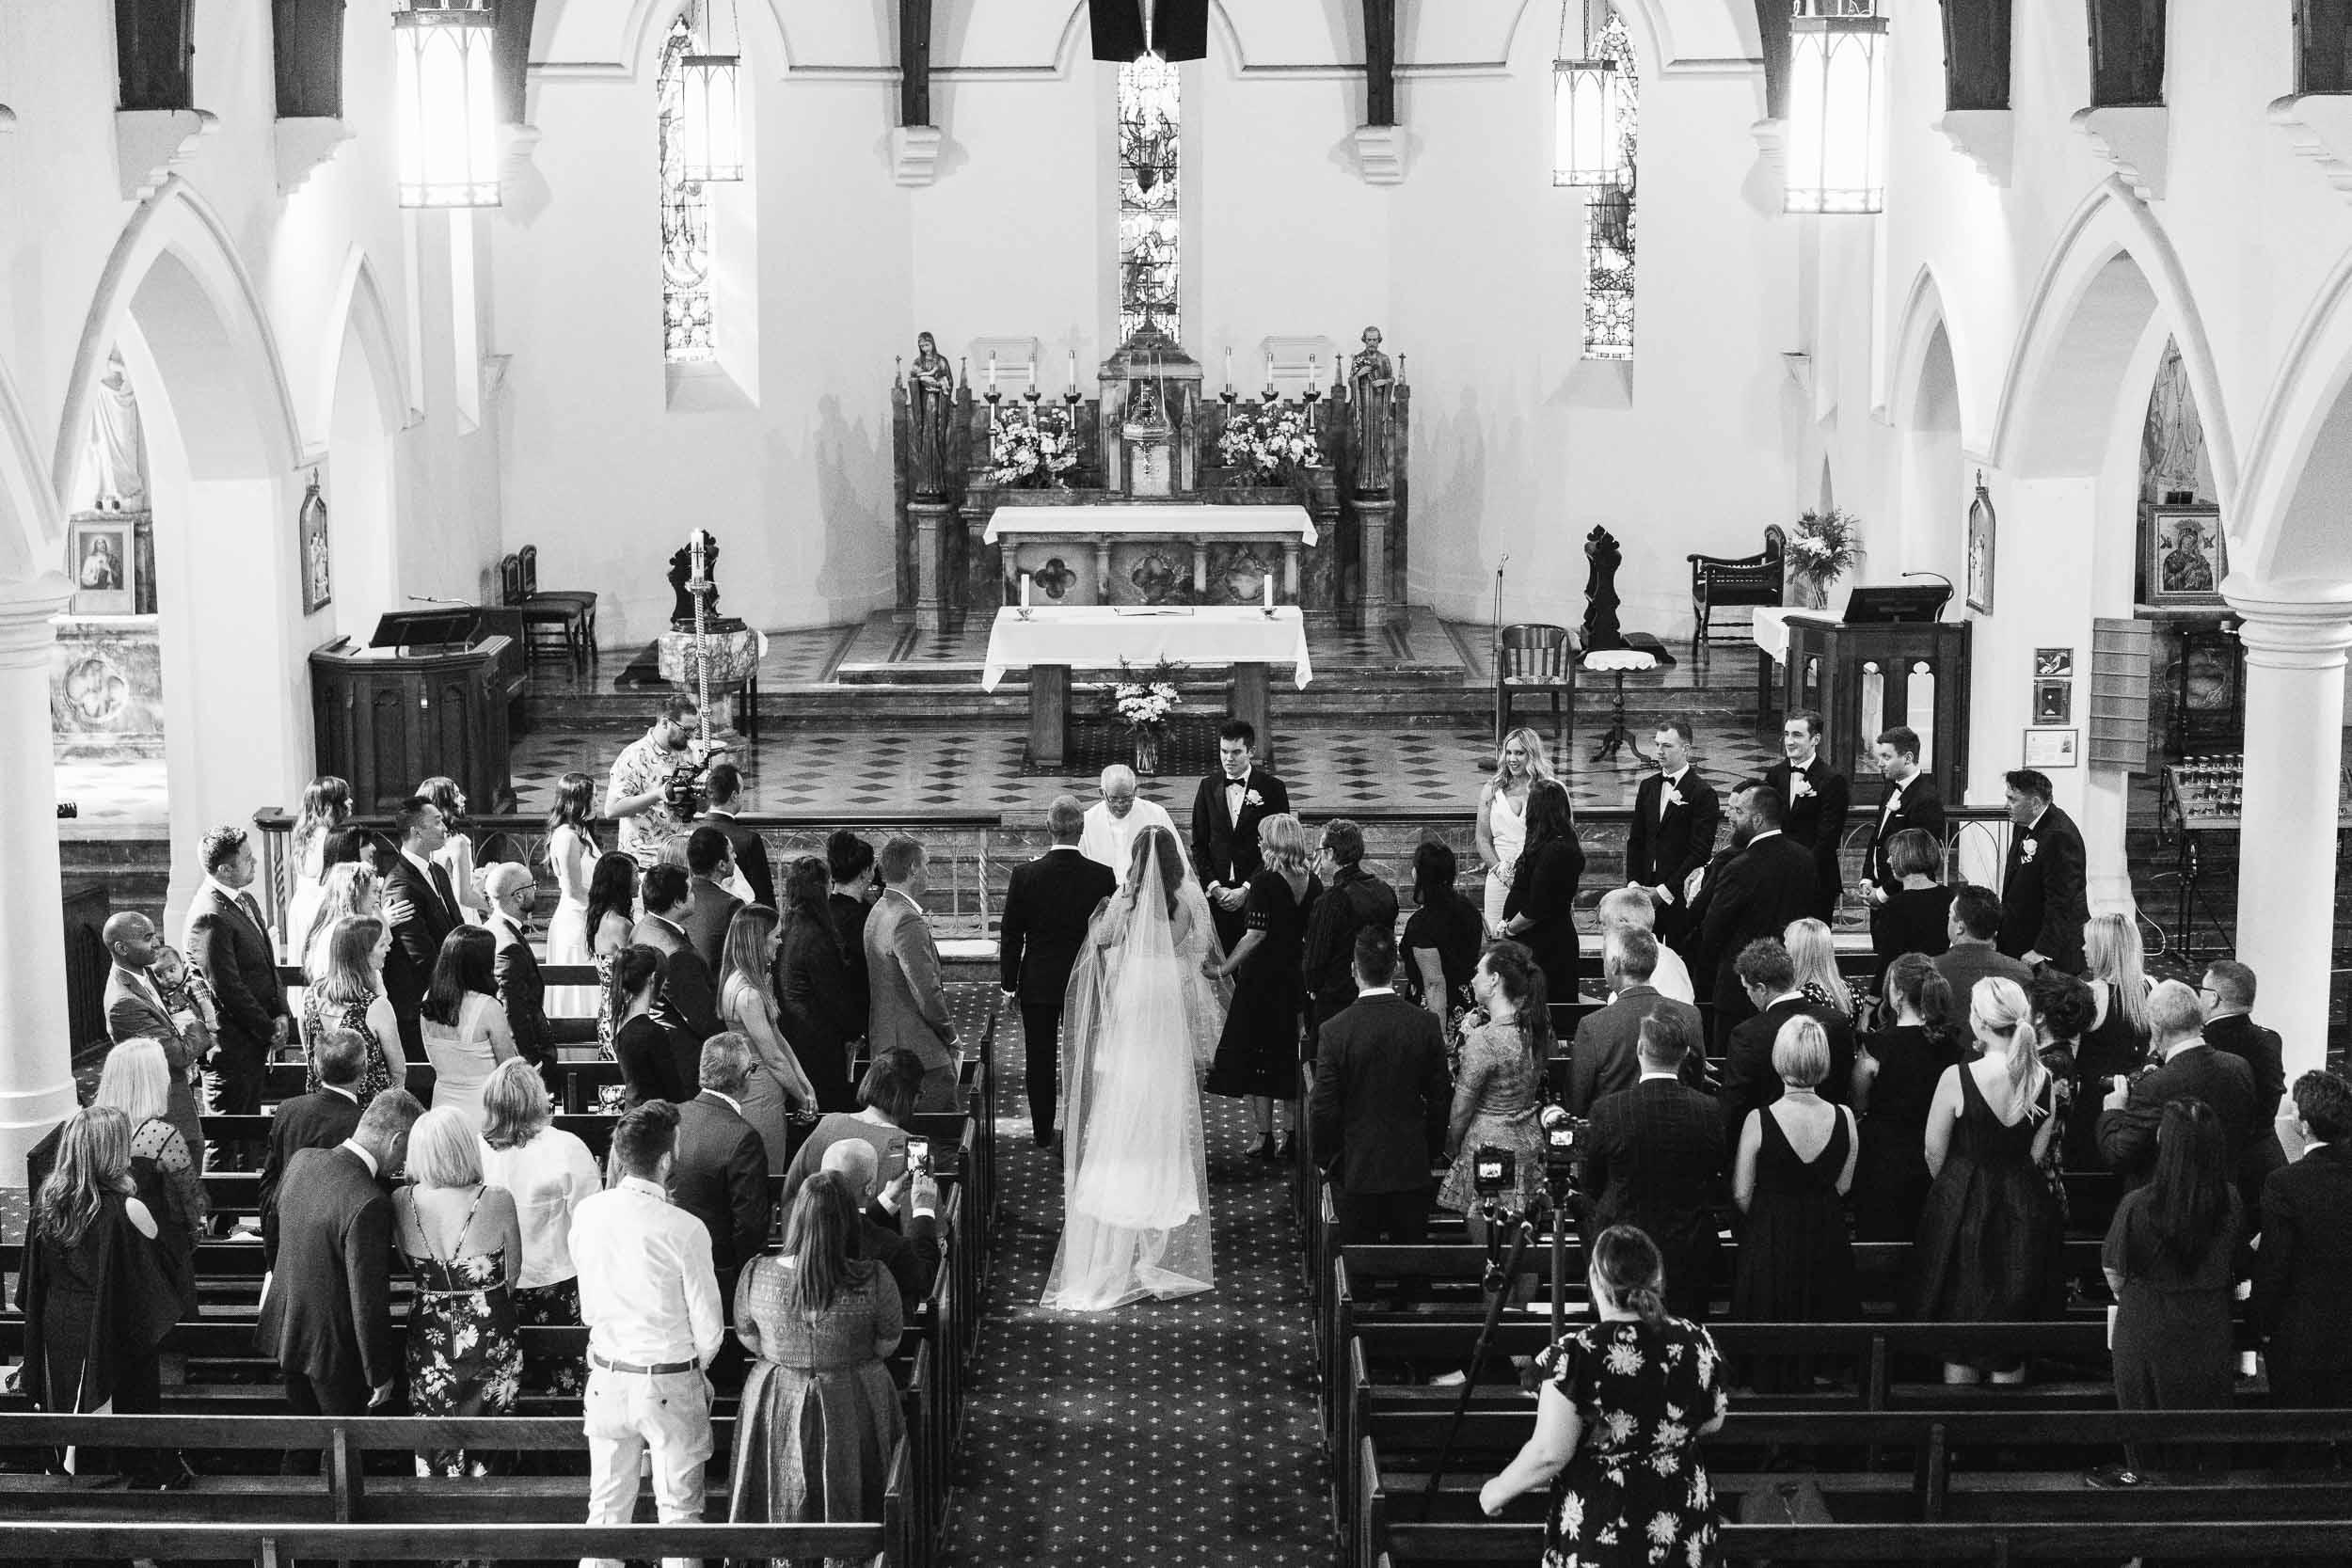 Kas-Richards-Wedding-Photographer-Melbourne-City-Wedding-Alto-Event-Space-Jane-Hill-Bridal-Gown-28.jpg